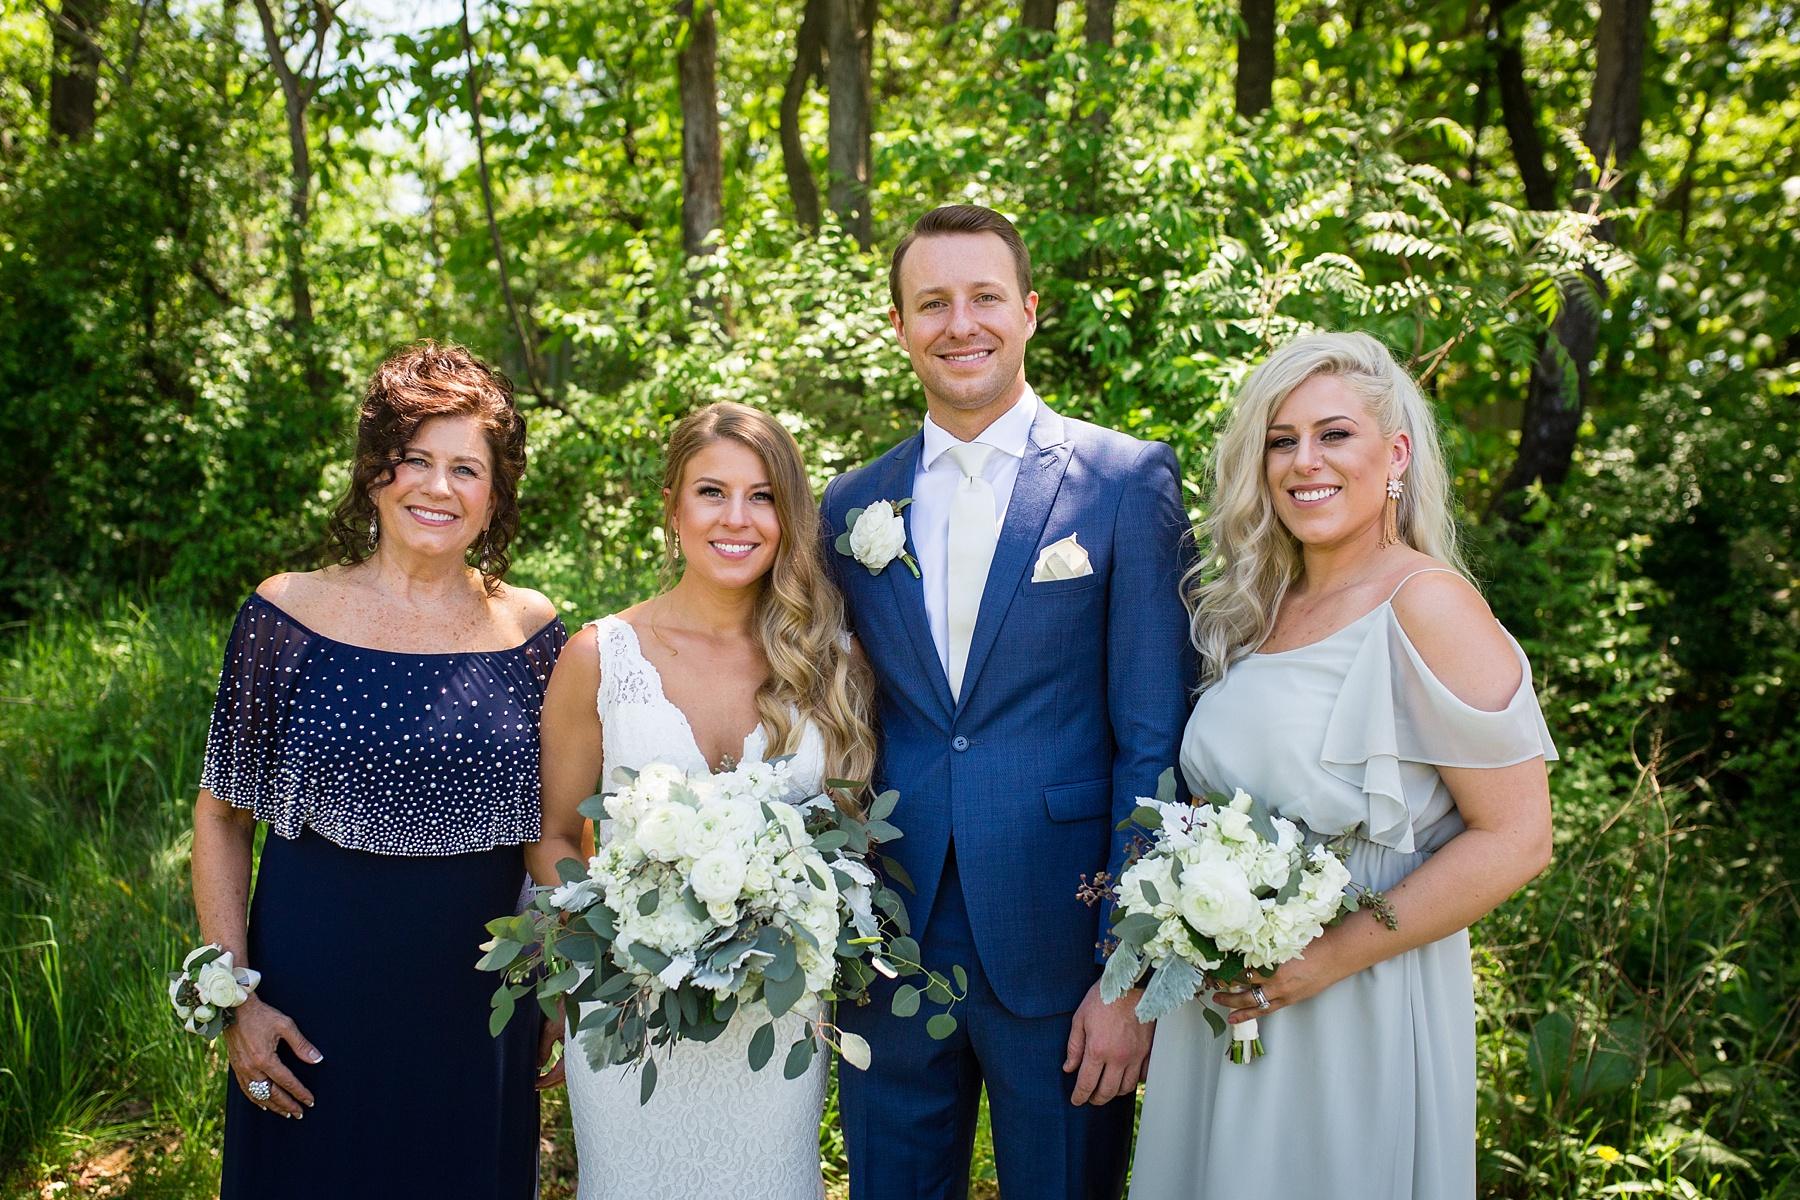 Brandon_Shafer_Photography_Kara_Doug_12_corners_Wedding_Benton_Harbor_0029.jpg